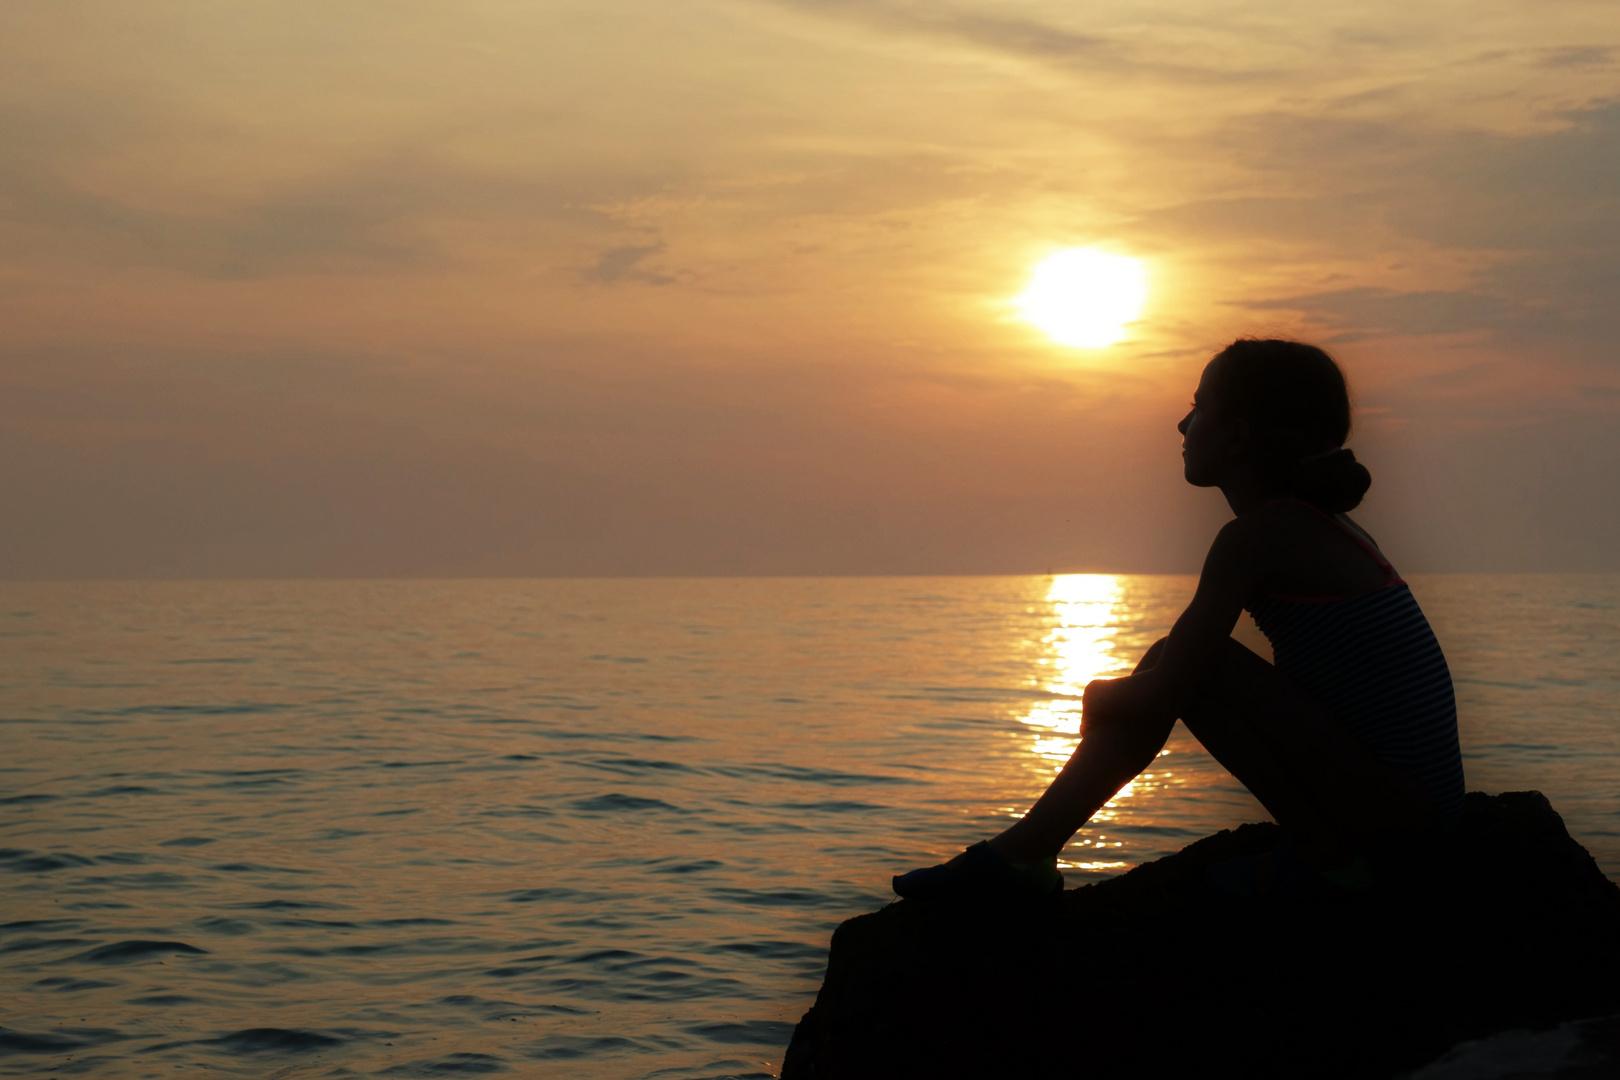 Mädchen am Meer Foto & Bild | kinder, kinder im schulalter